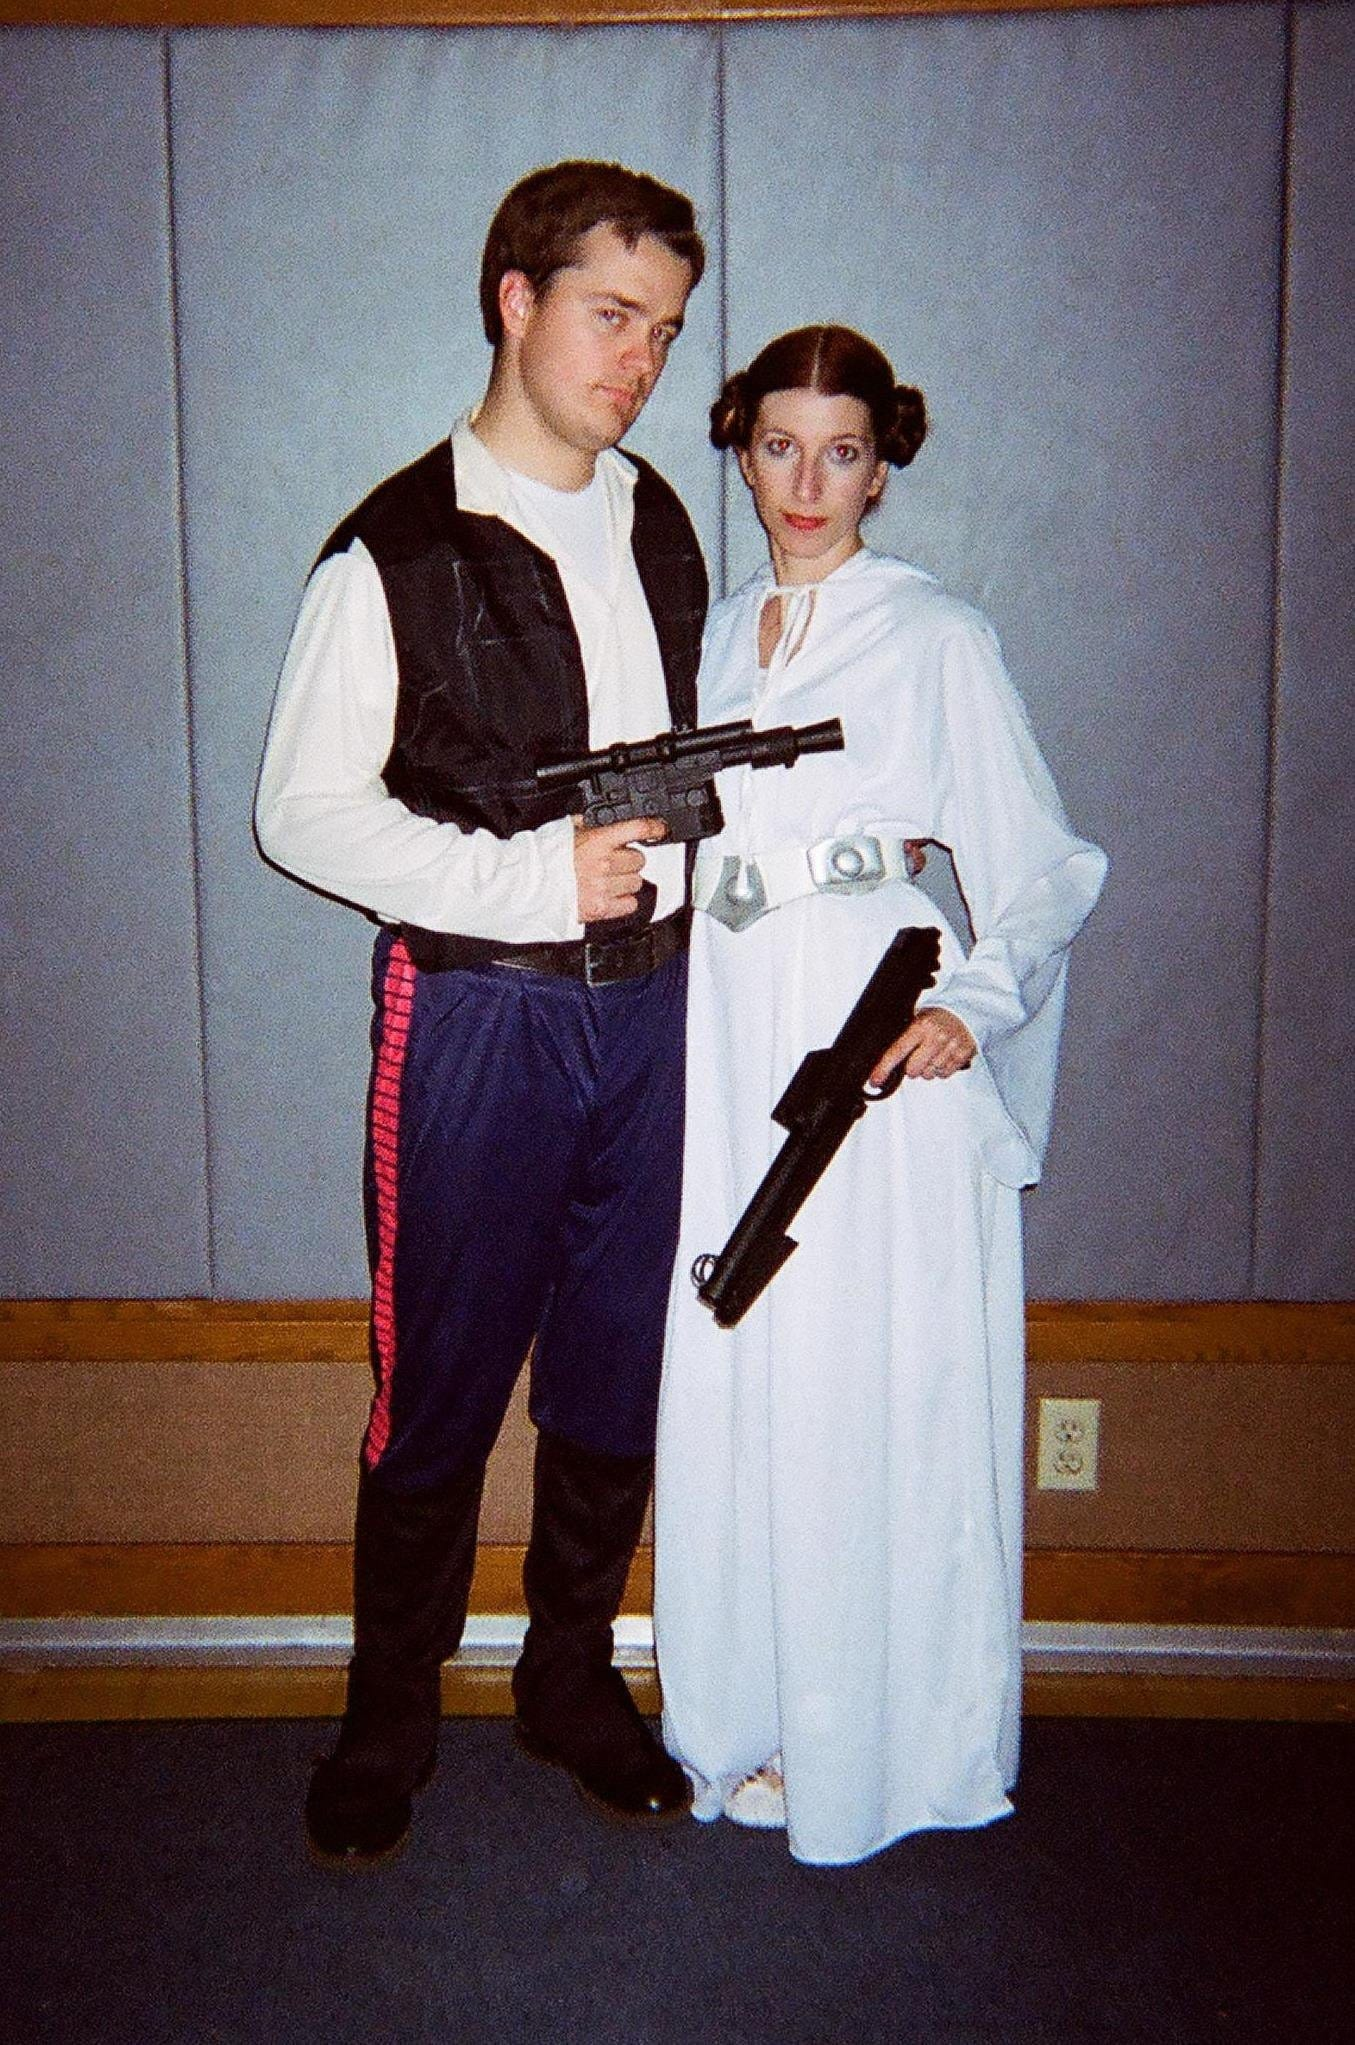 Kari-2011 Halloween-Hans Solo & Princess Leia